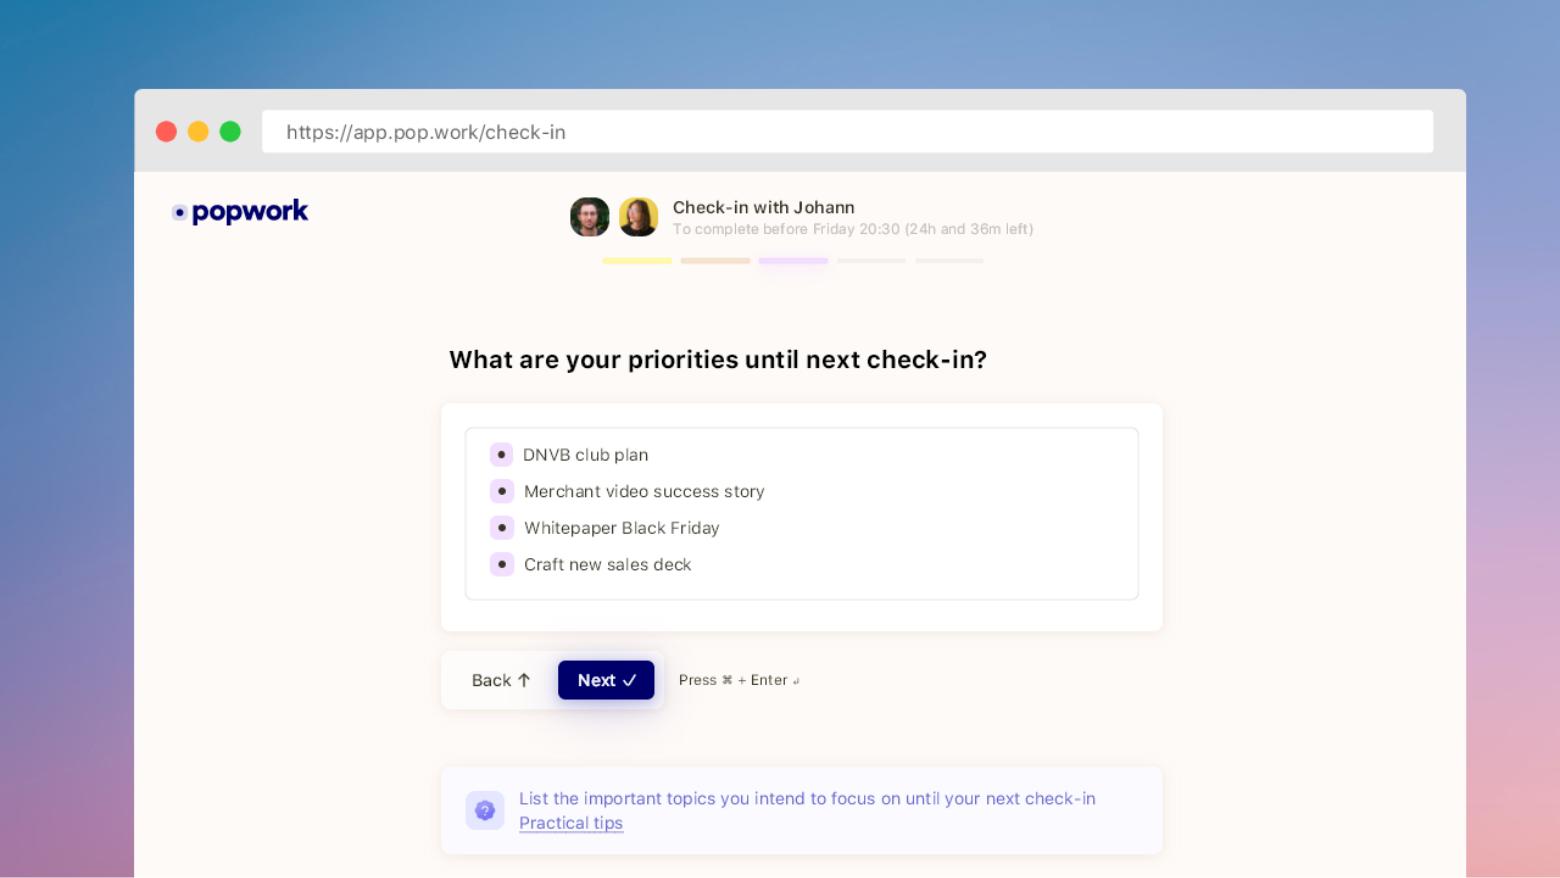 Screenshot of a Popwork check-in